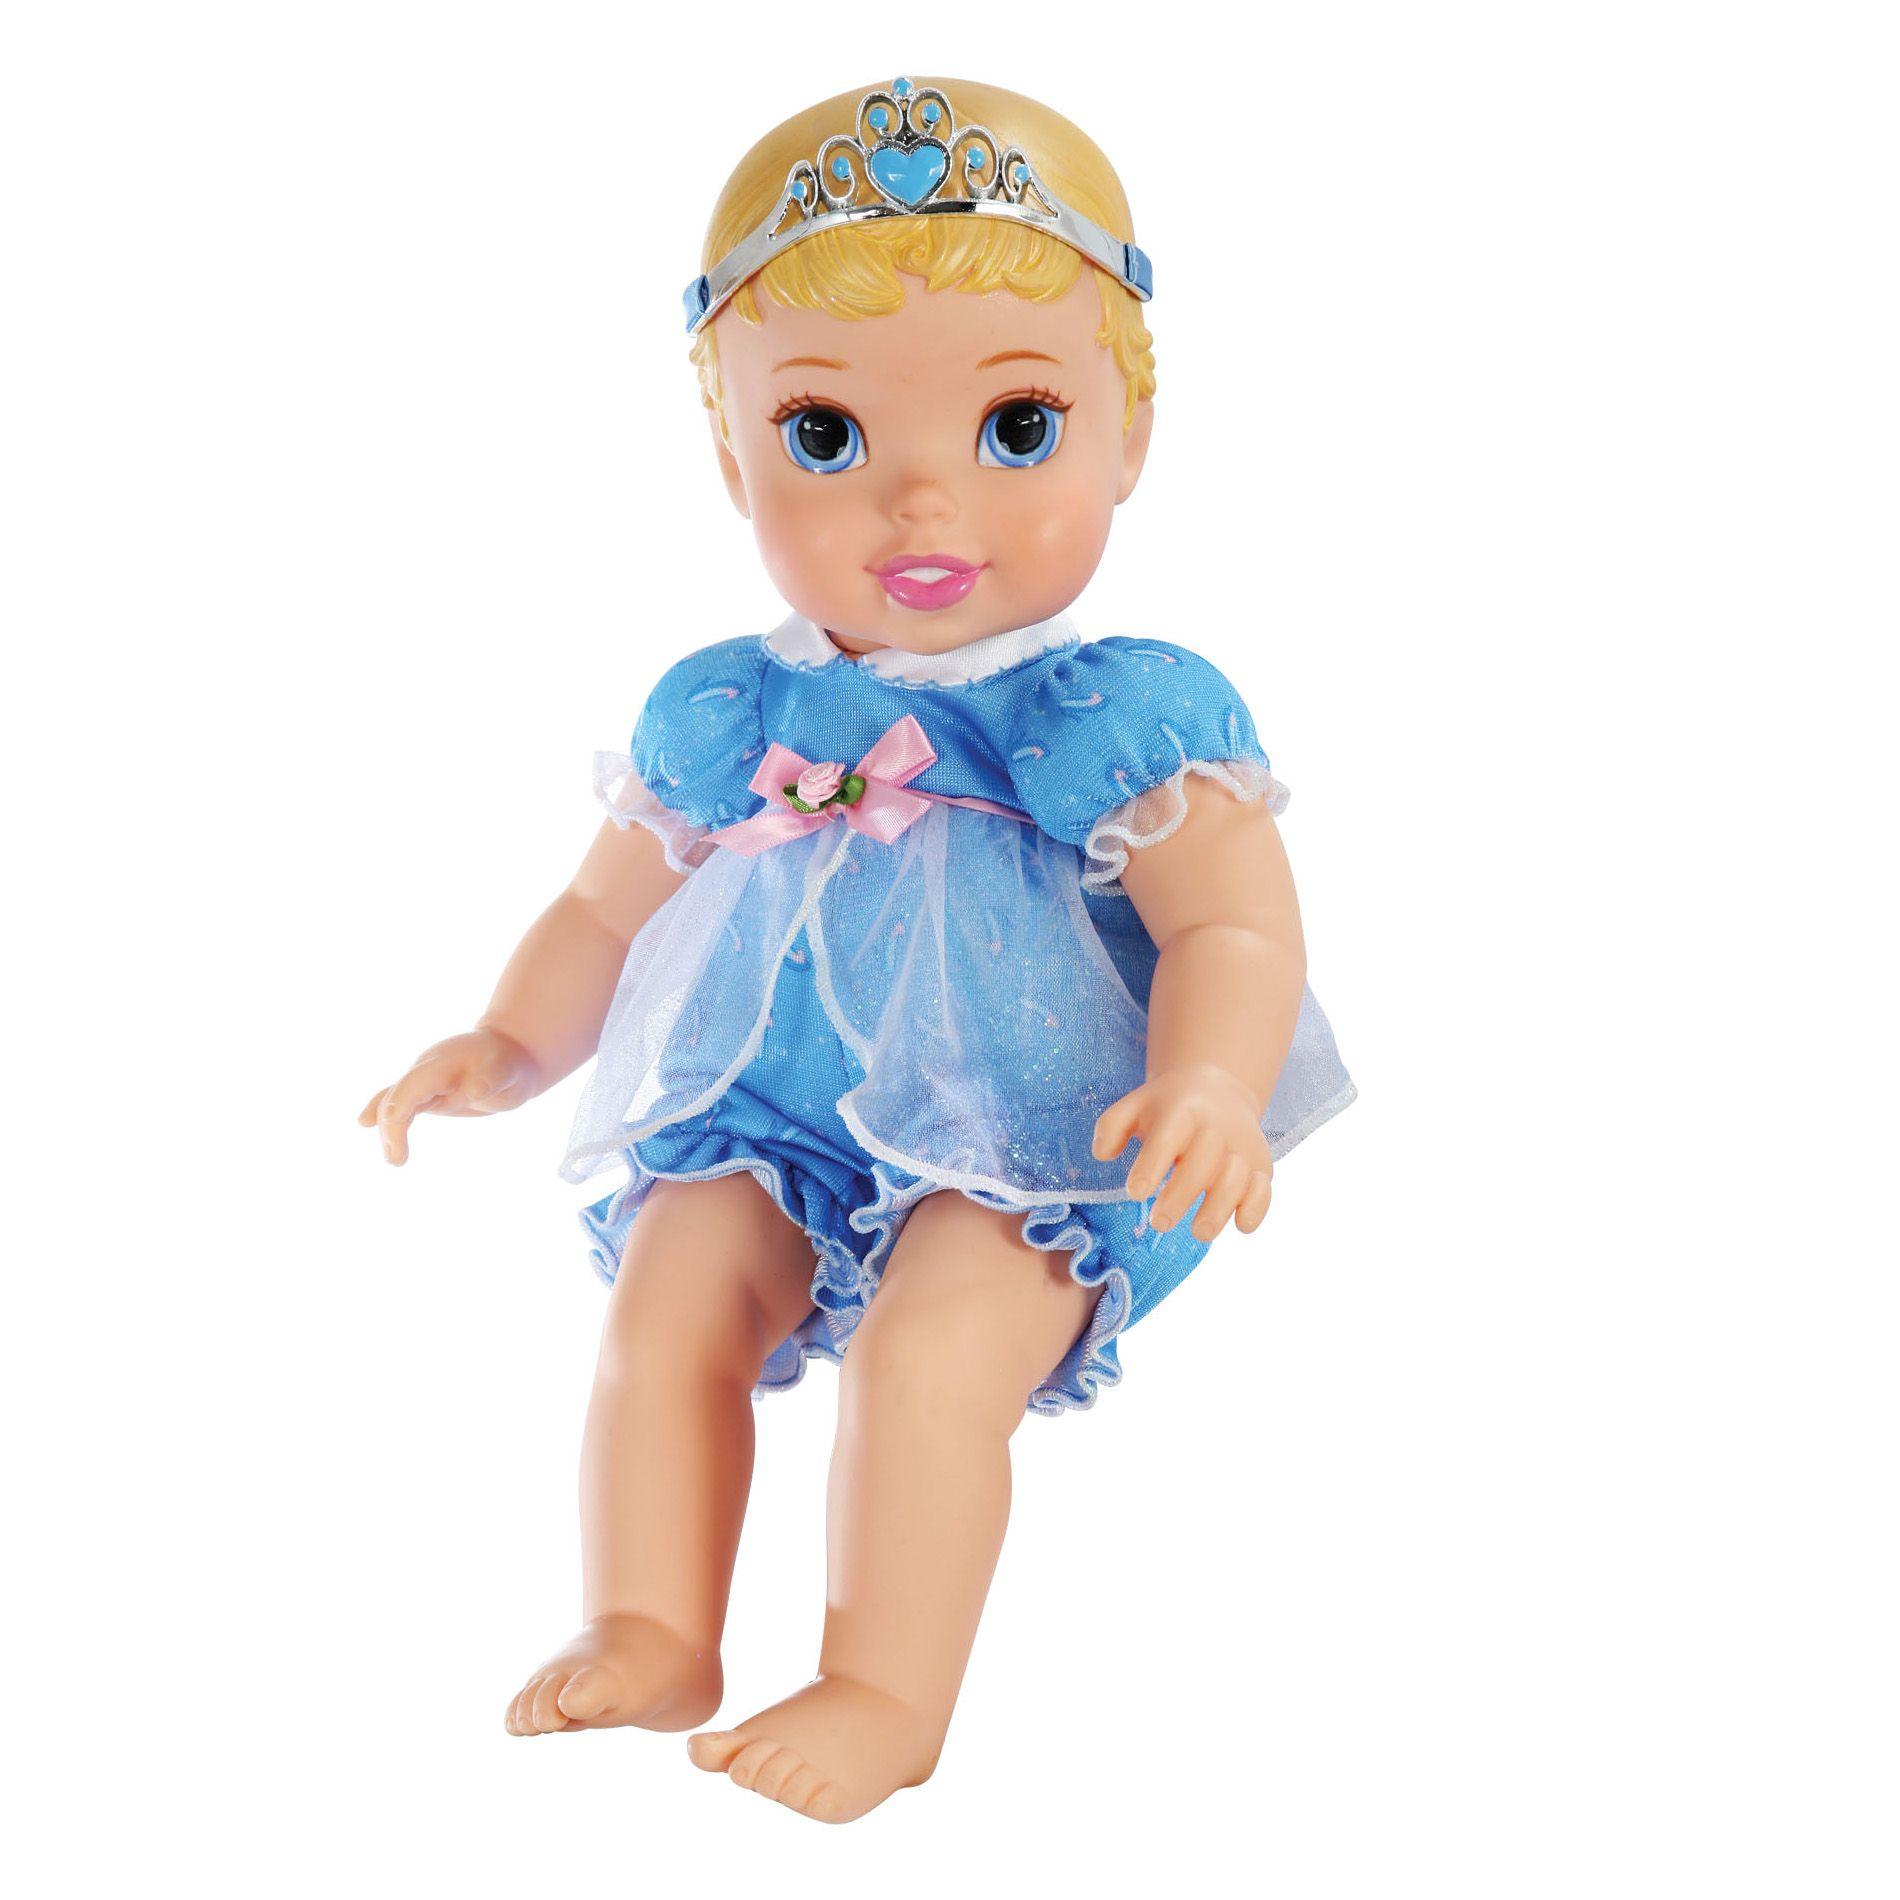 Disney Princess Toys : Disney princess baby cinderella toys games dolls